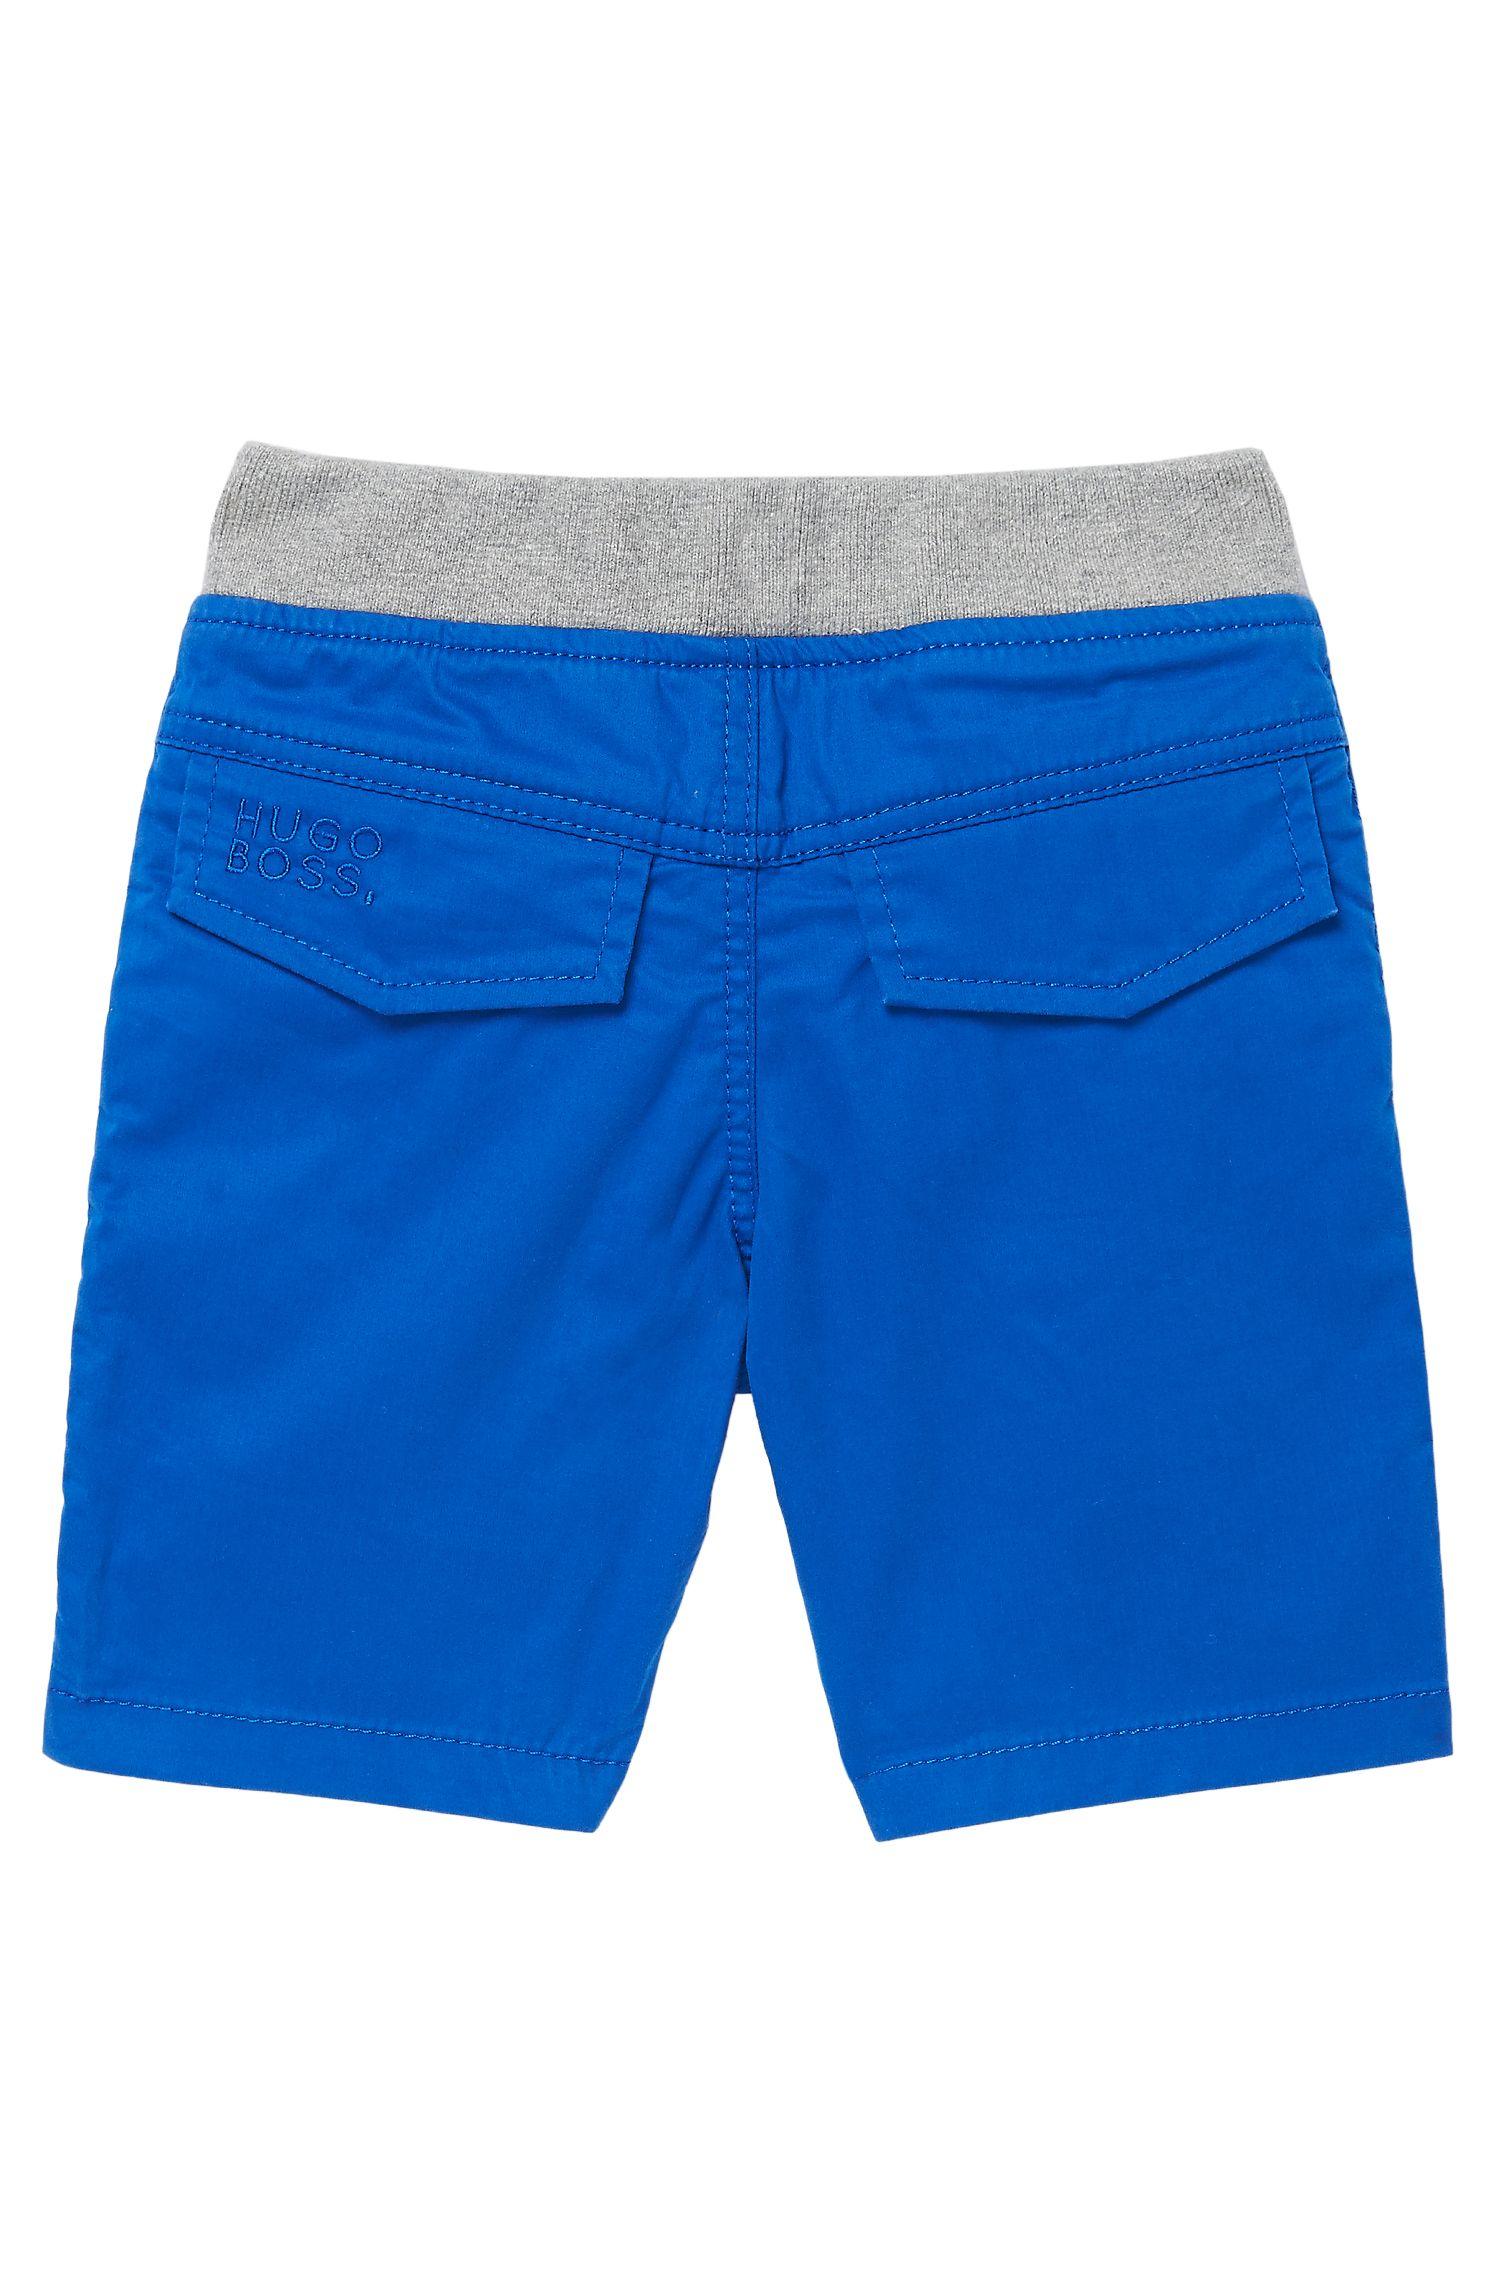 'J04146' | Toddler Cotton Twill Bermuda Shorts